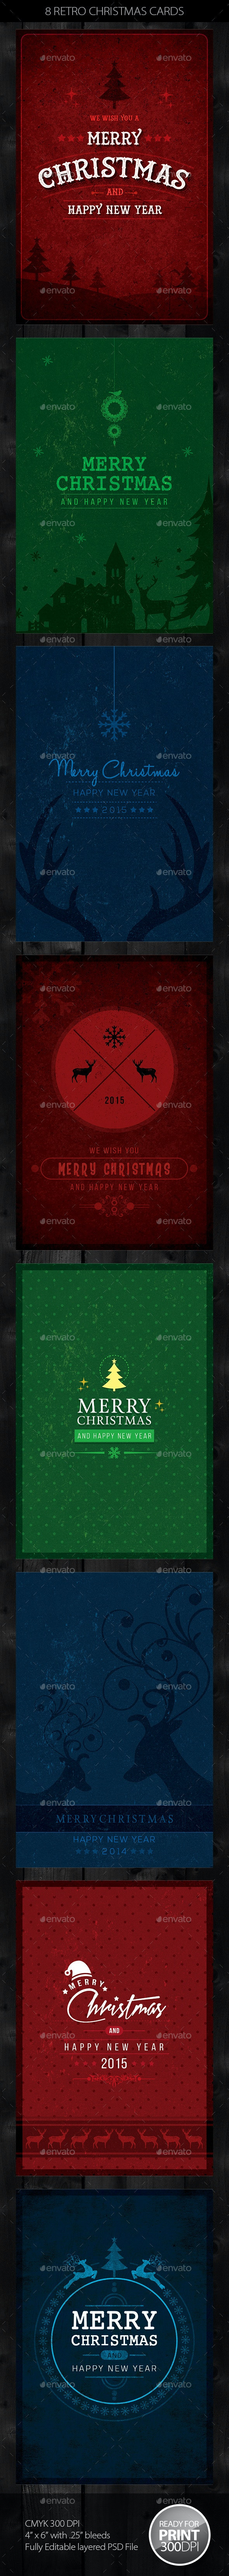 8 Retro Christmas Cards / Invite - Holiday Greeting Cards